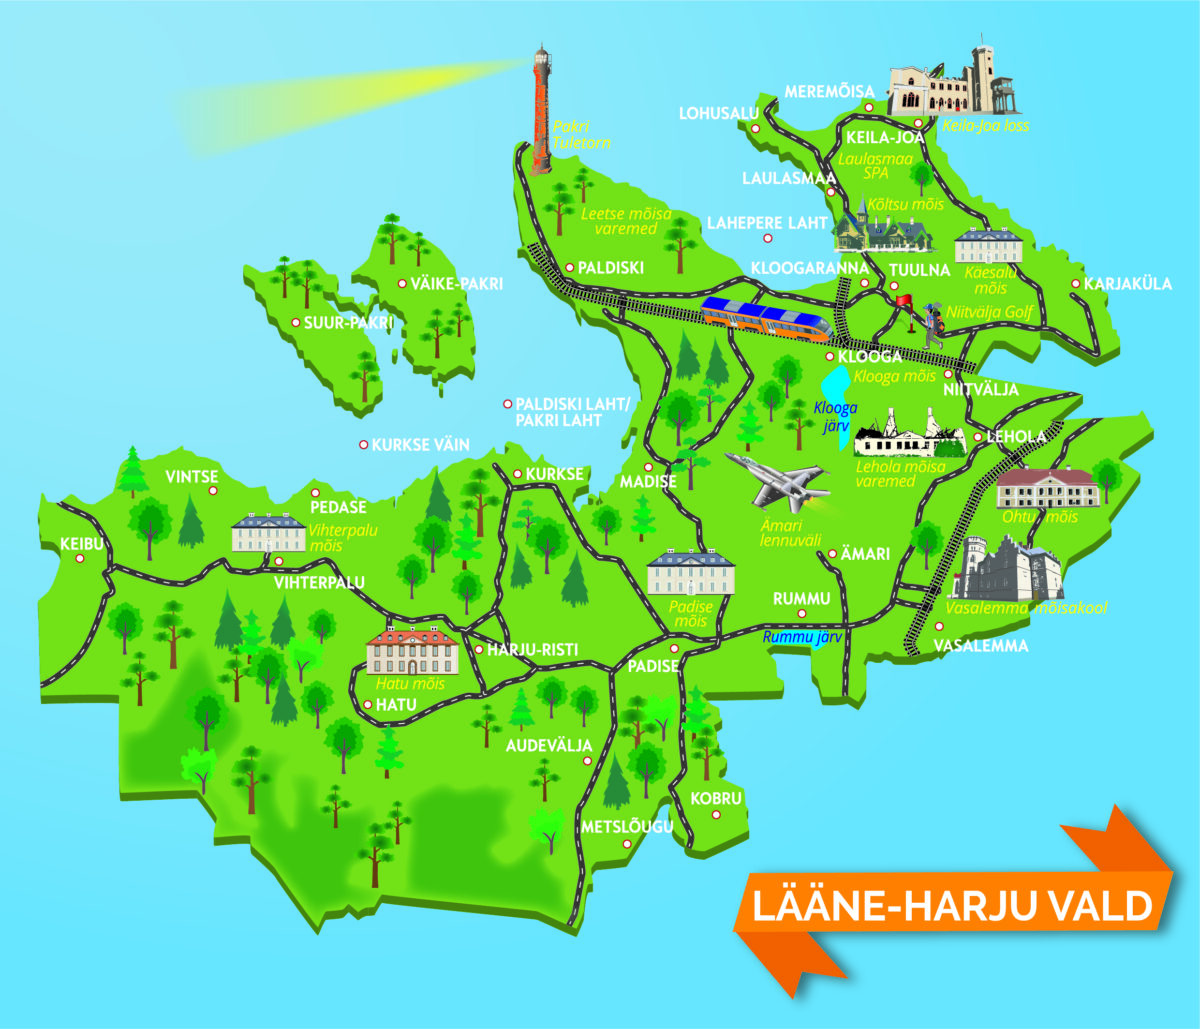 Lääne-Harju Vald